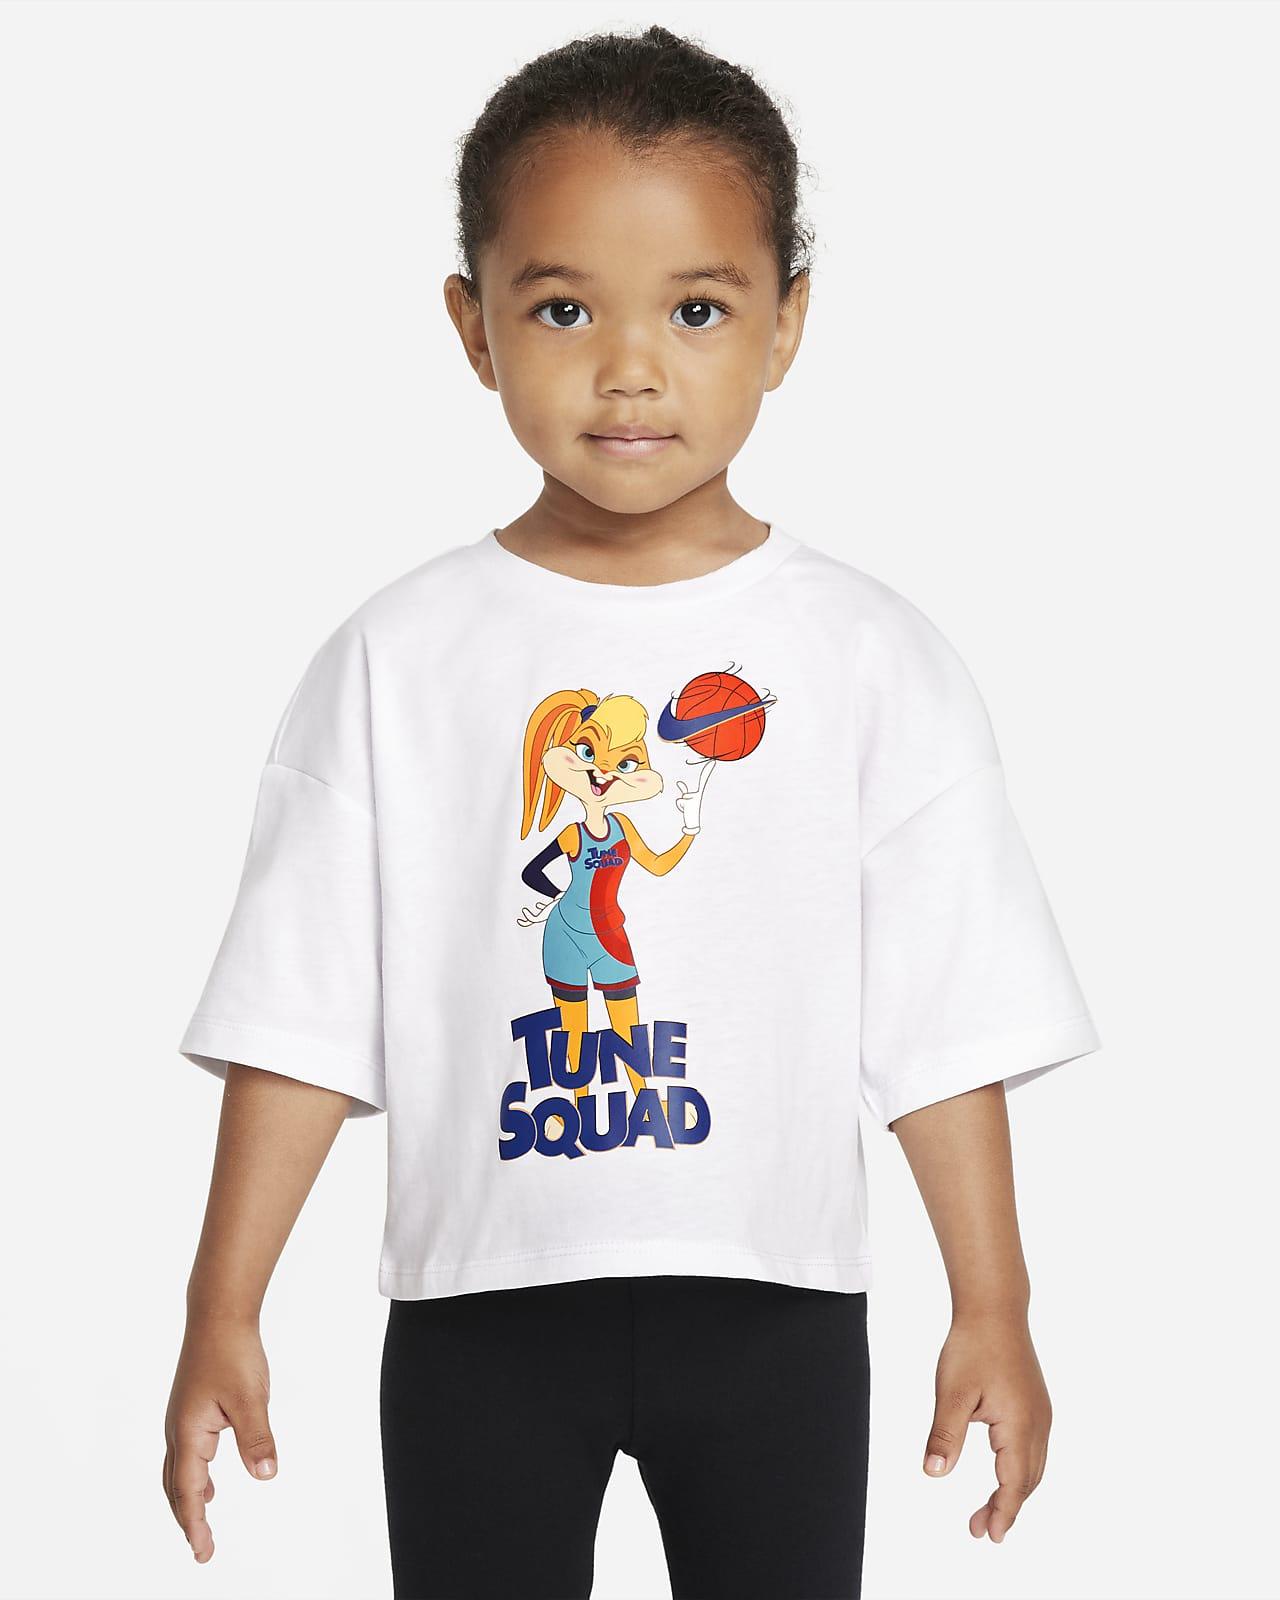 Tee-shirt Nike pour Petit enfant